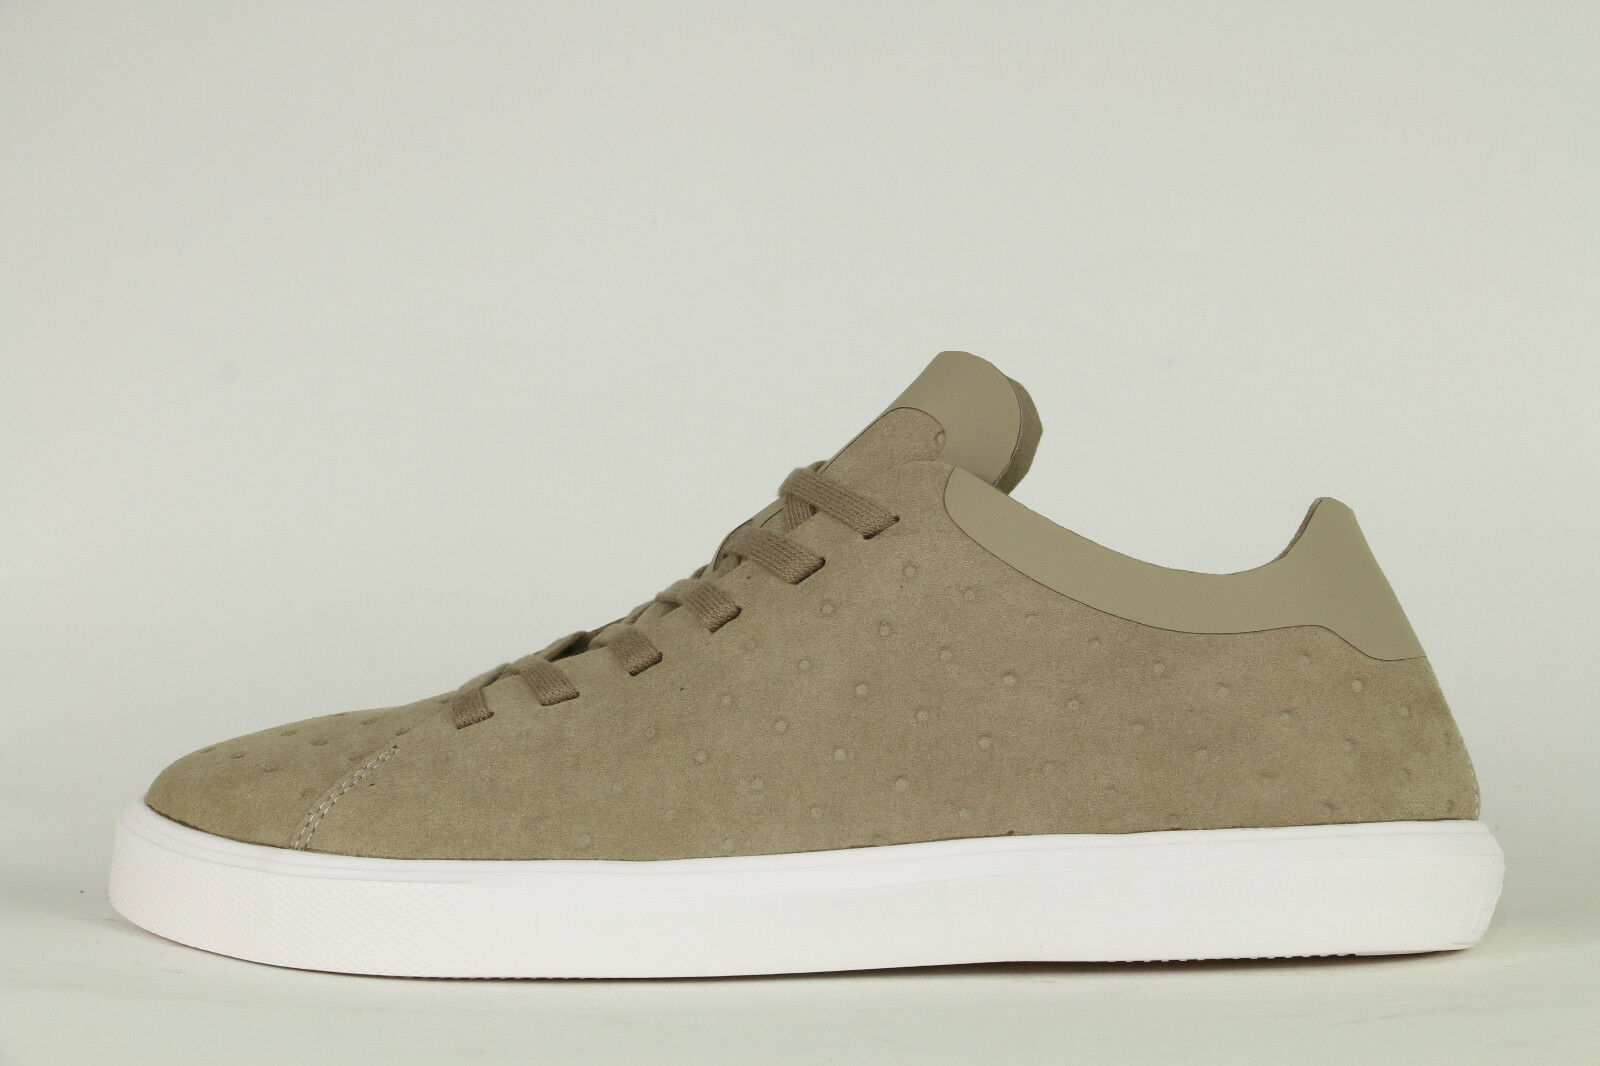 Native monaco low rocky marrón shell blancoo-zapatos-mens-Beige